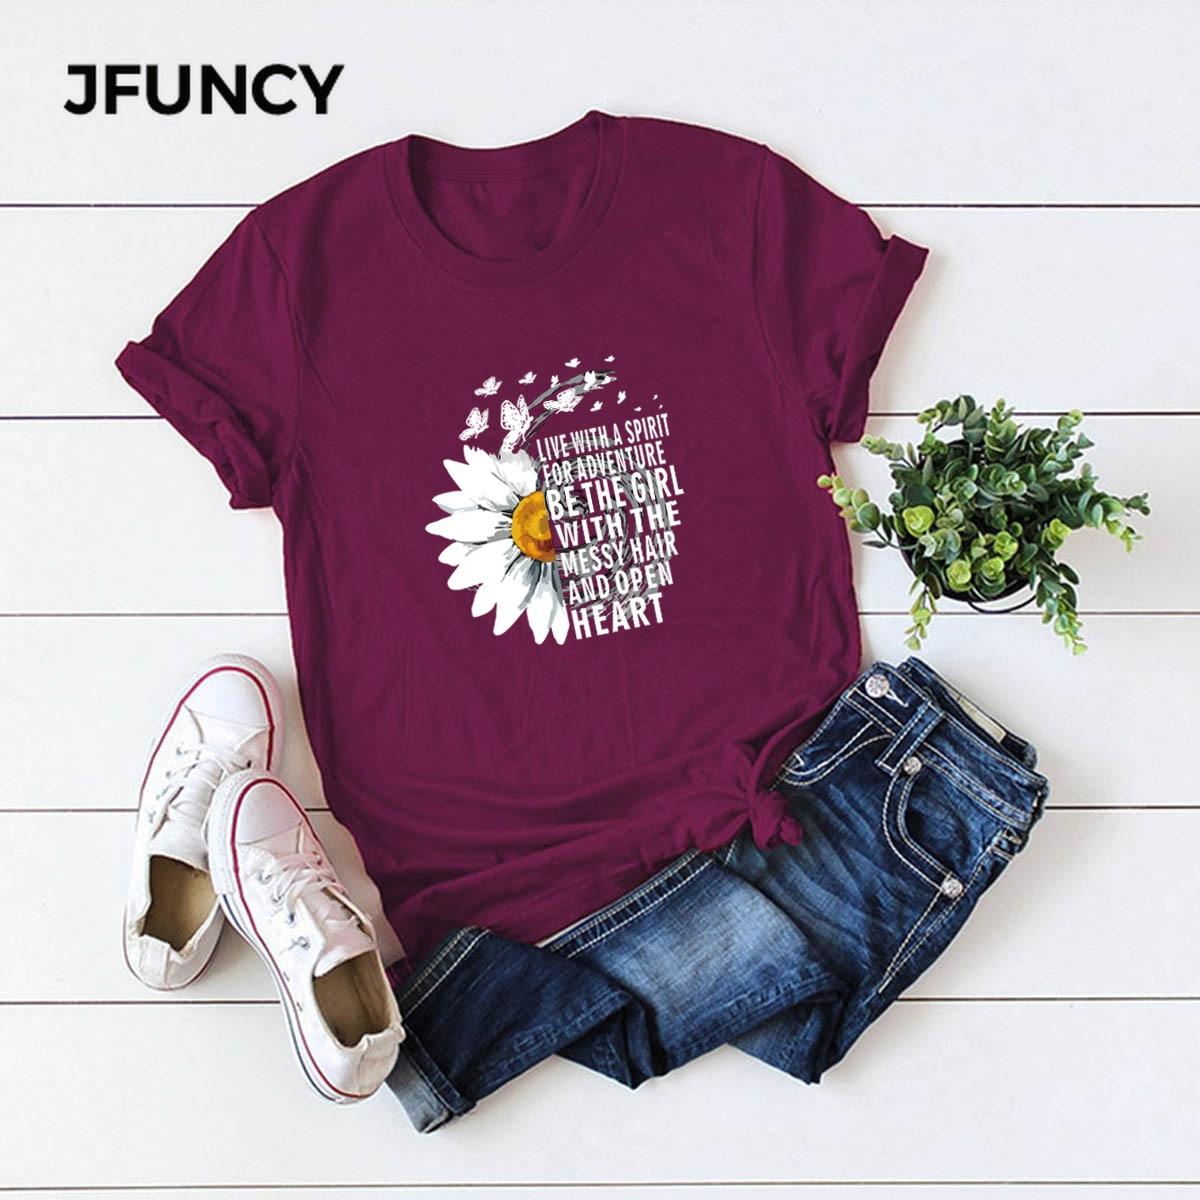 JFUNCY 2020 New Summer Cotton Women T-shirts Creative Chrysanthemum Inspirational Letter Print T Shirt Plus Size Mujer Tee Tops